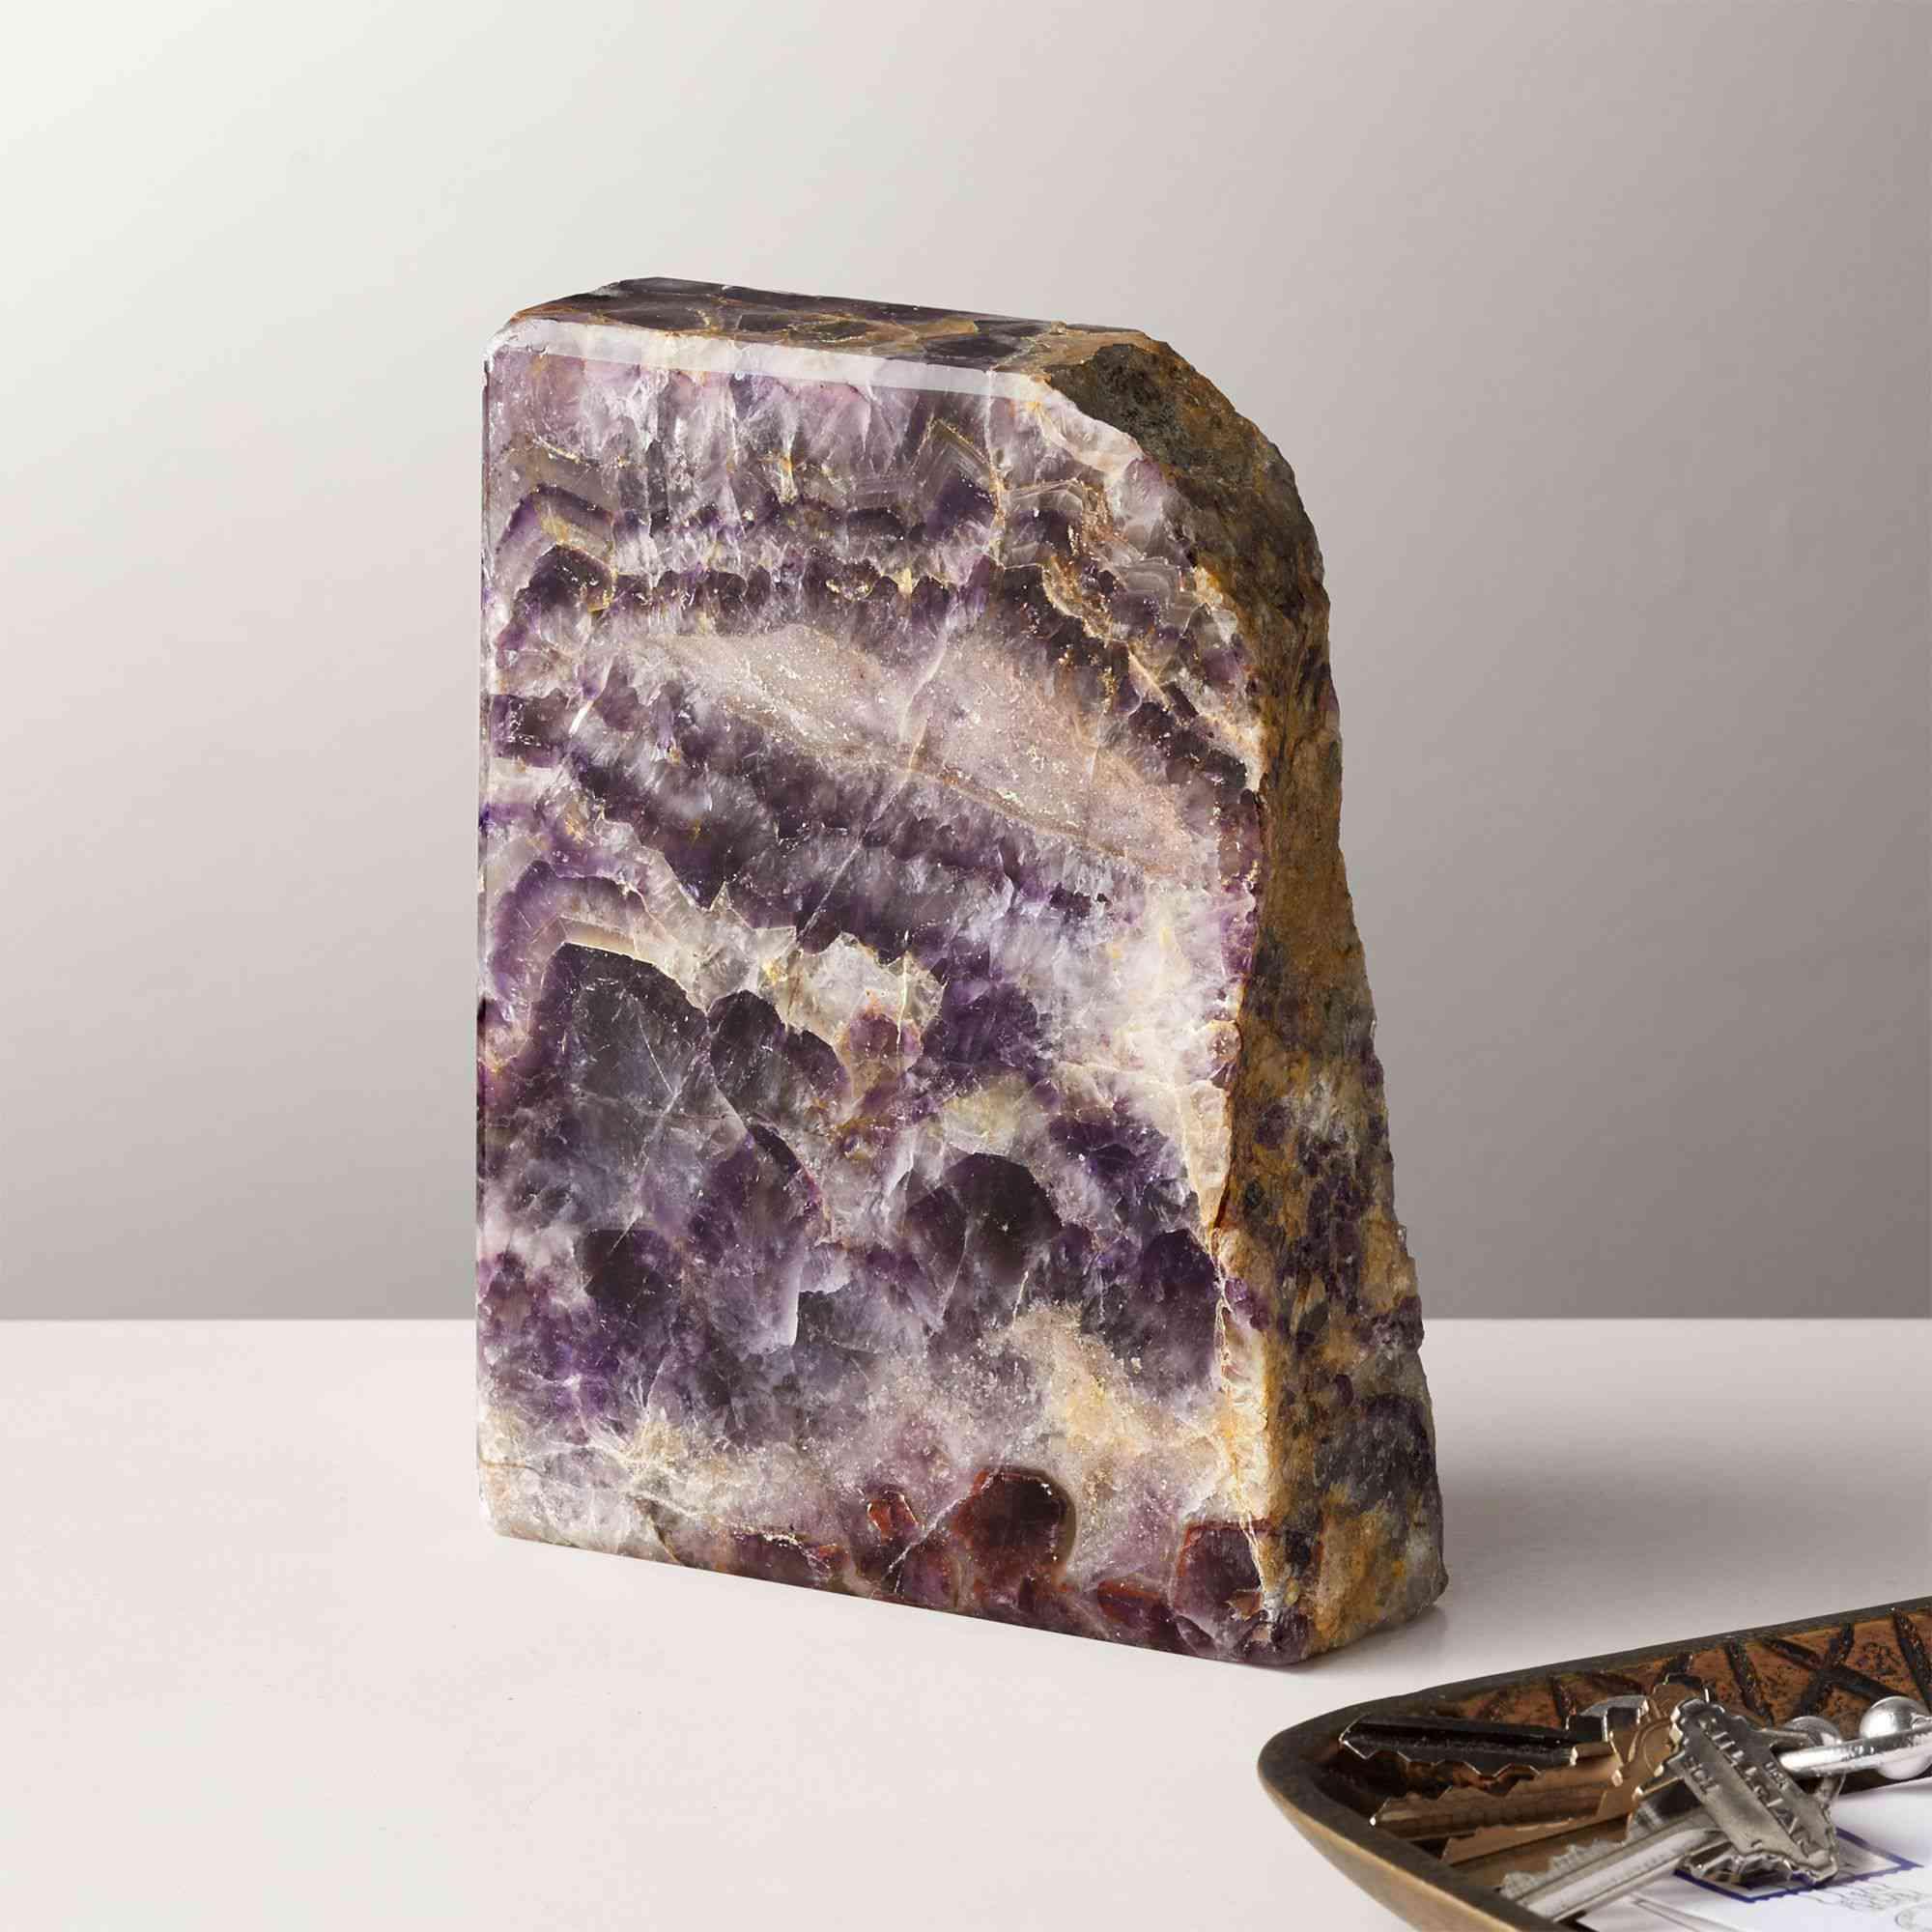 A raw amethyst objet d'art.